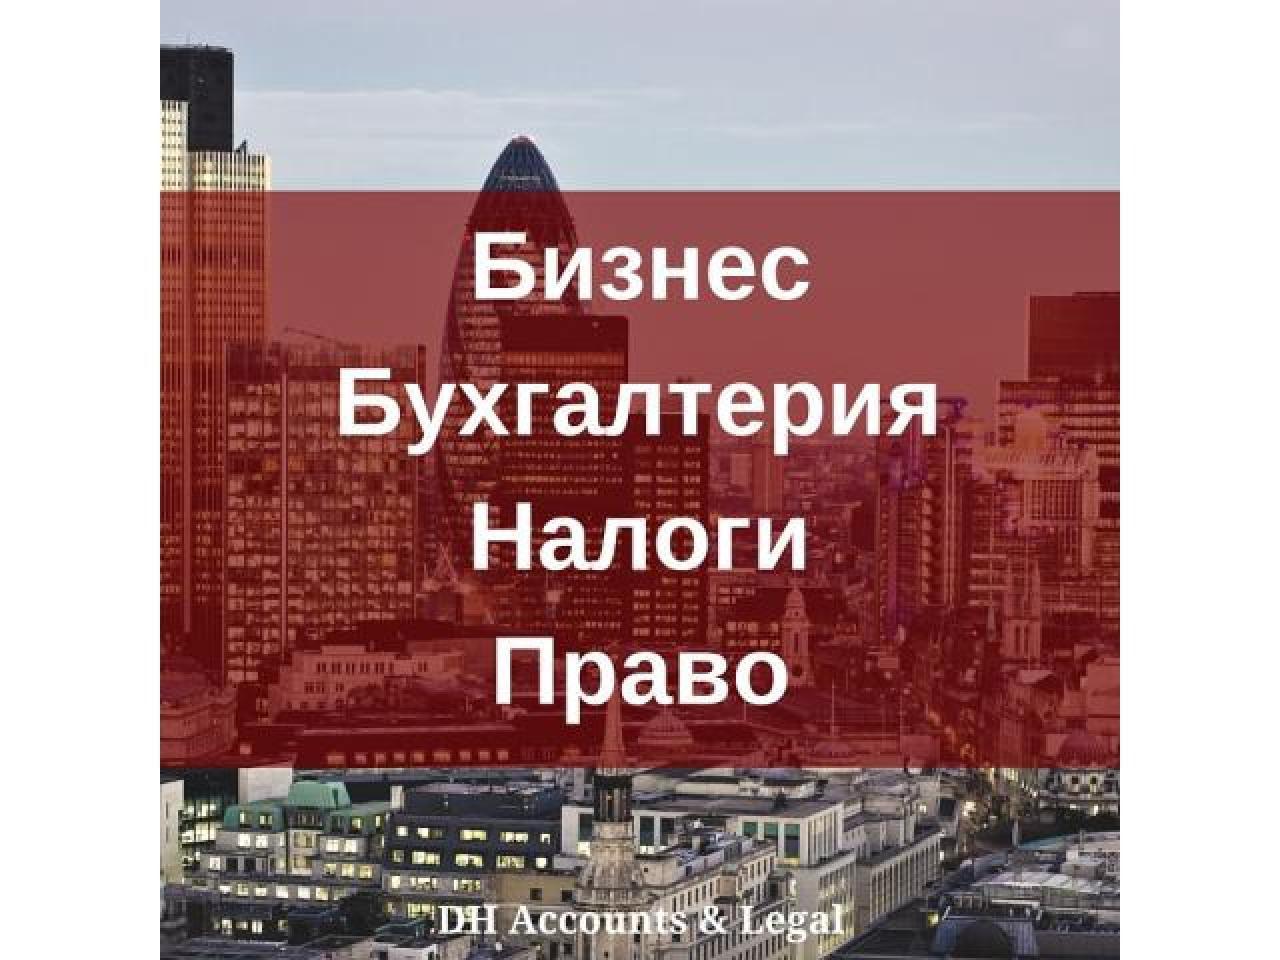 Cоздание, развитие и ведение бизнеса в Великобритании. - 1